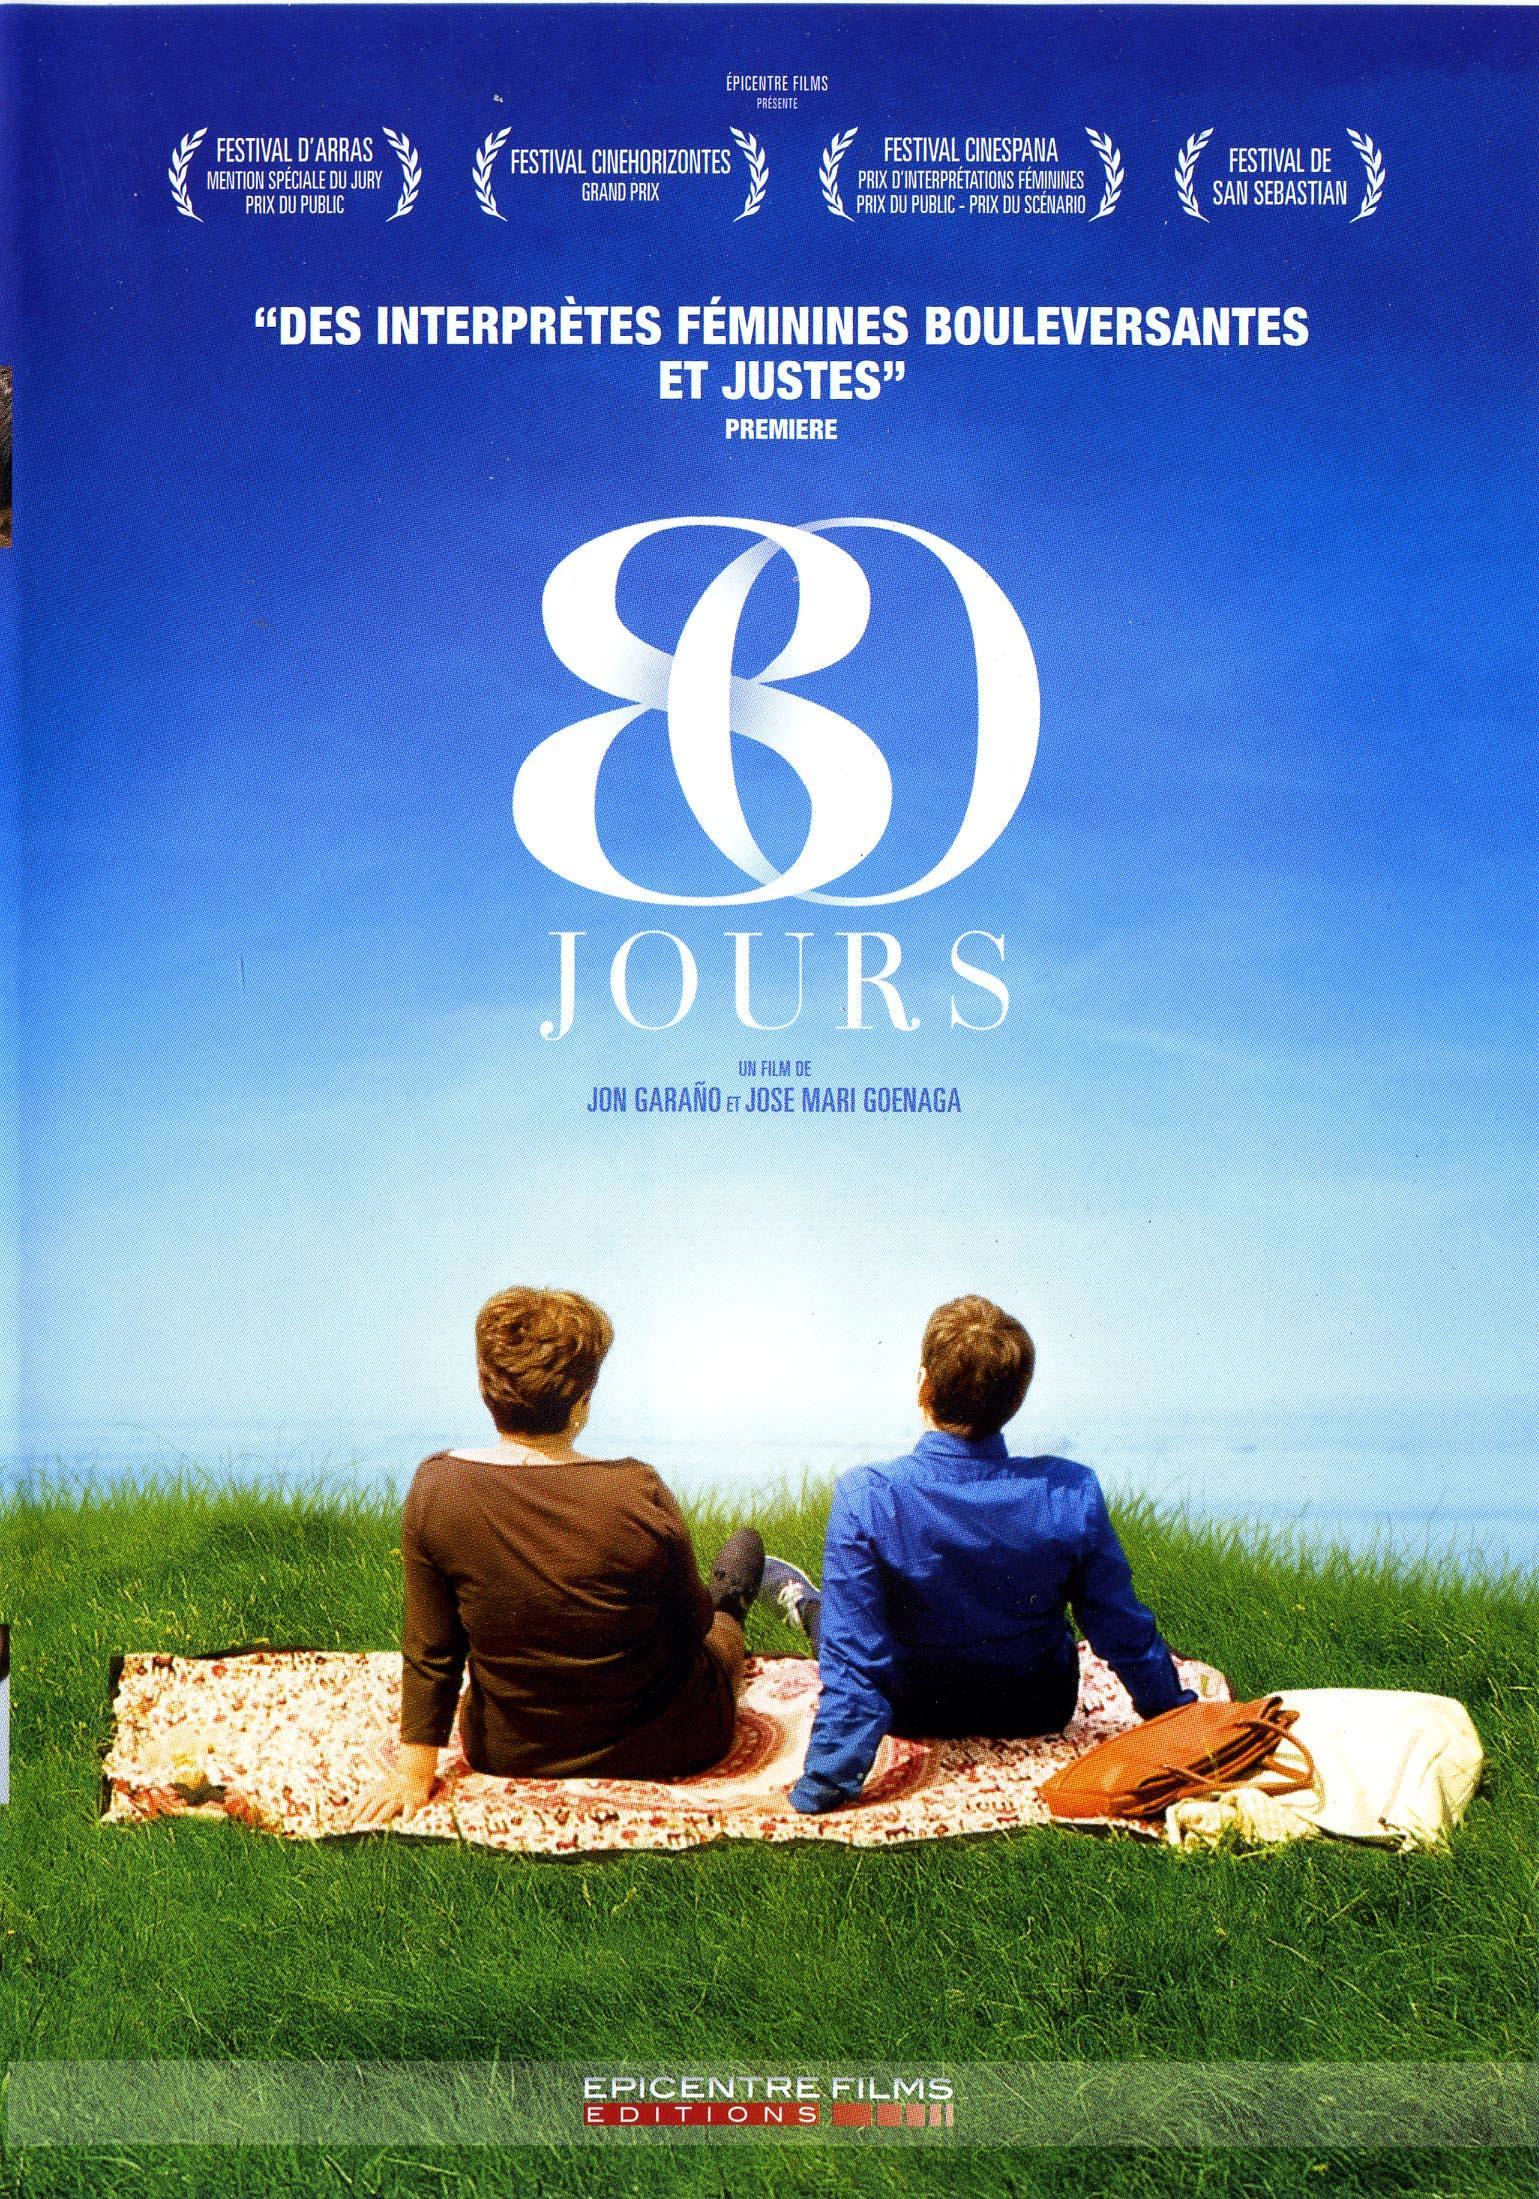 80 jours - dvd